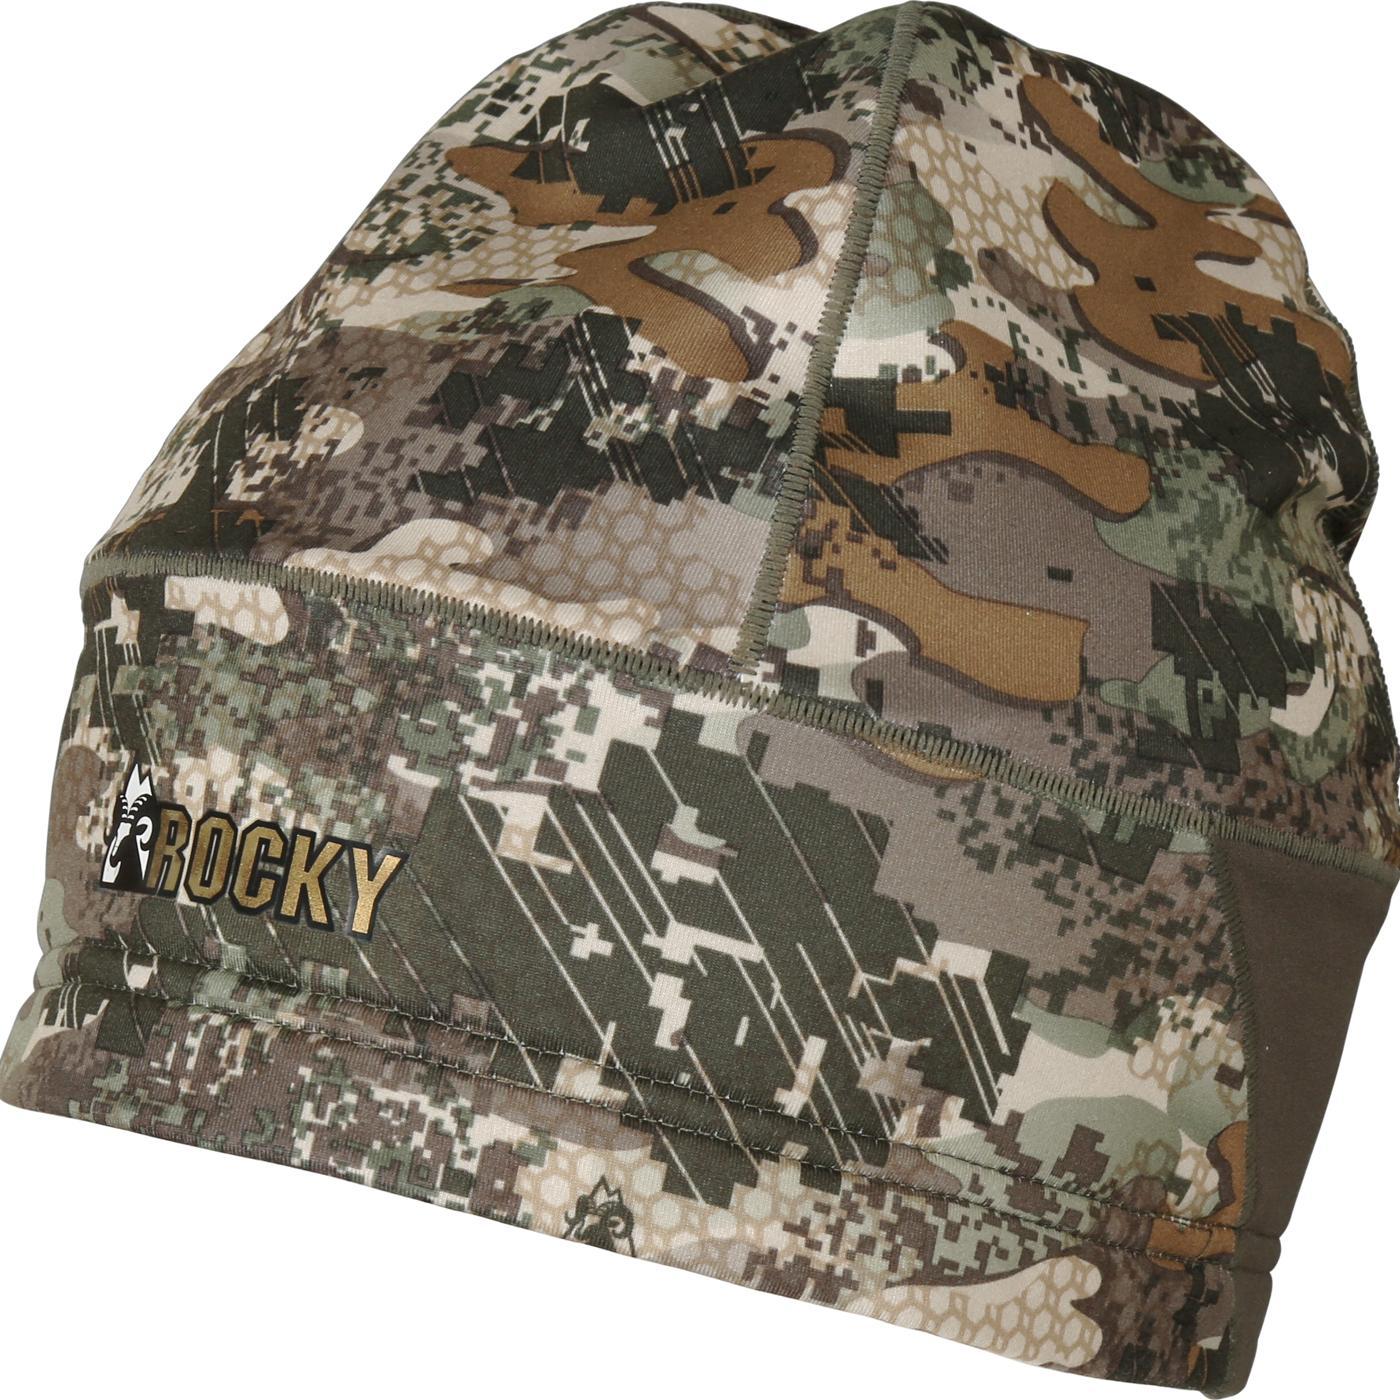 935f1c61e78 Rocky Venator Men s Camouflage Scent IQ Fleece Beanie Hat